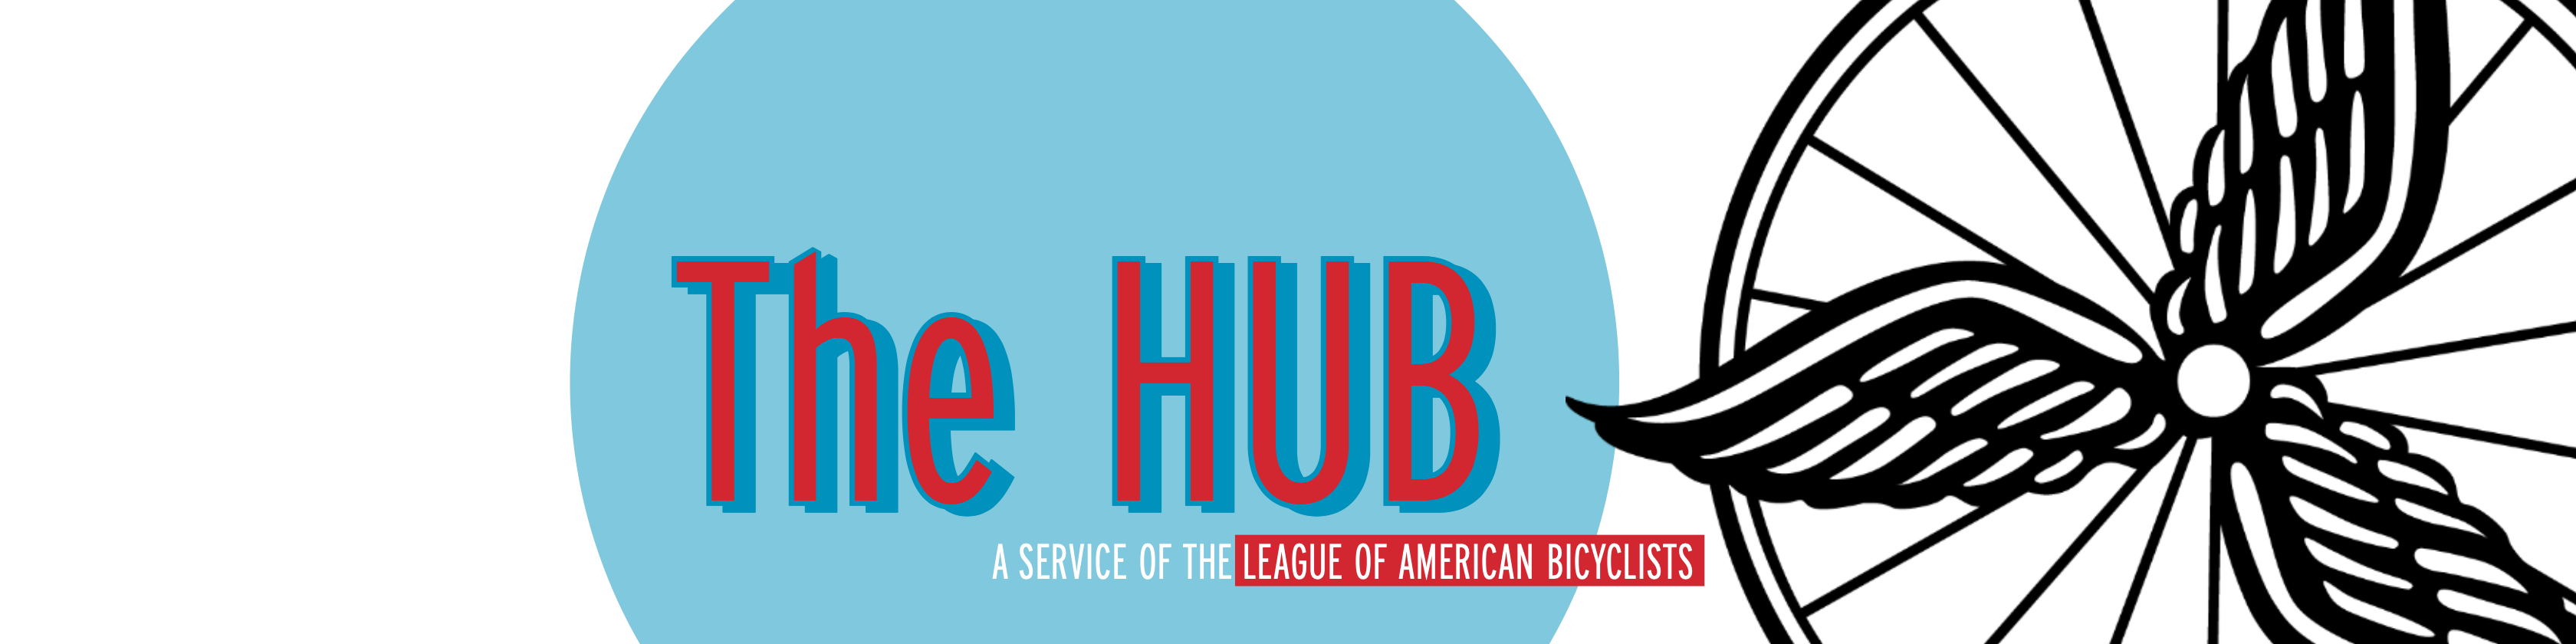 Bike League Hub